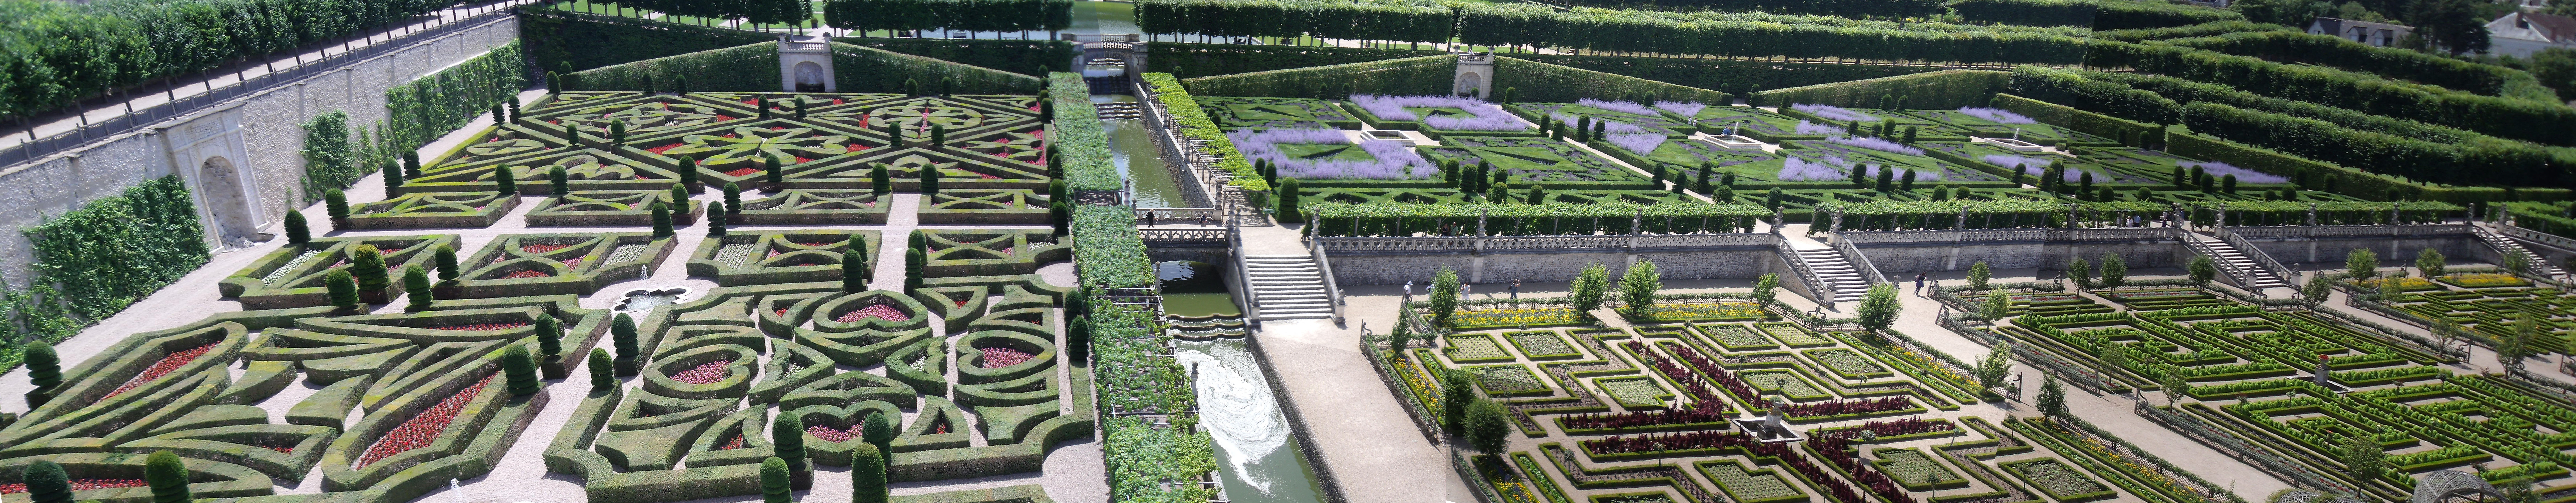 File Panorama Jardins Chateau De Villandry Jpg Wikimedia Commons